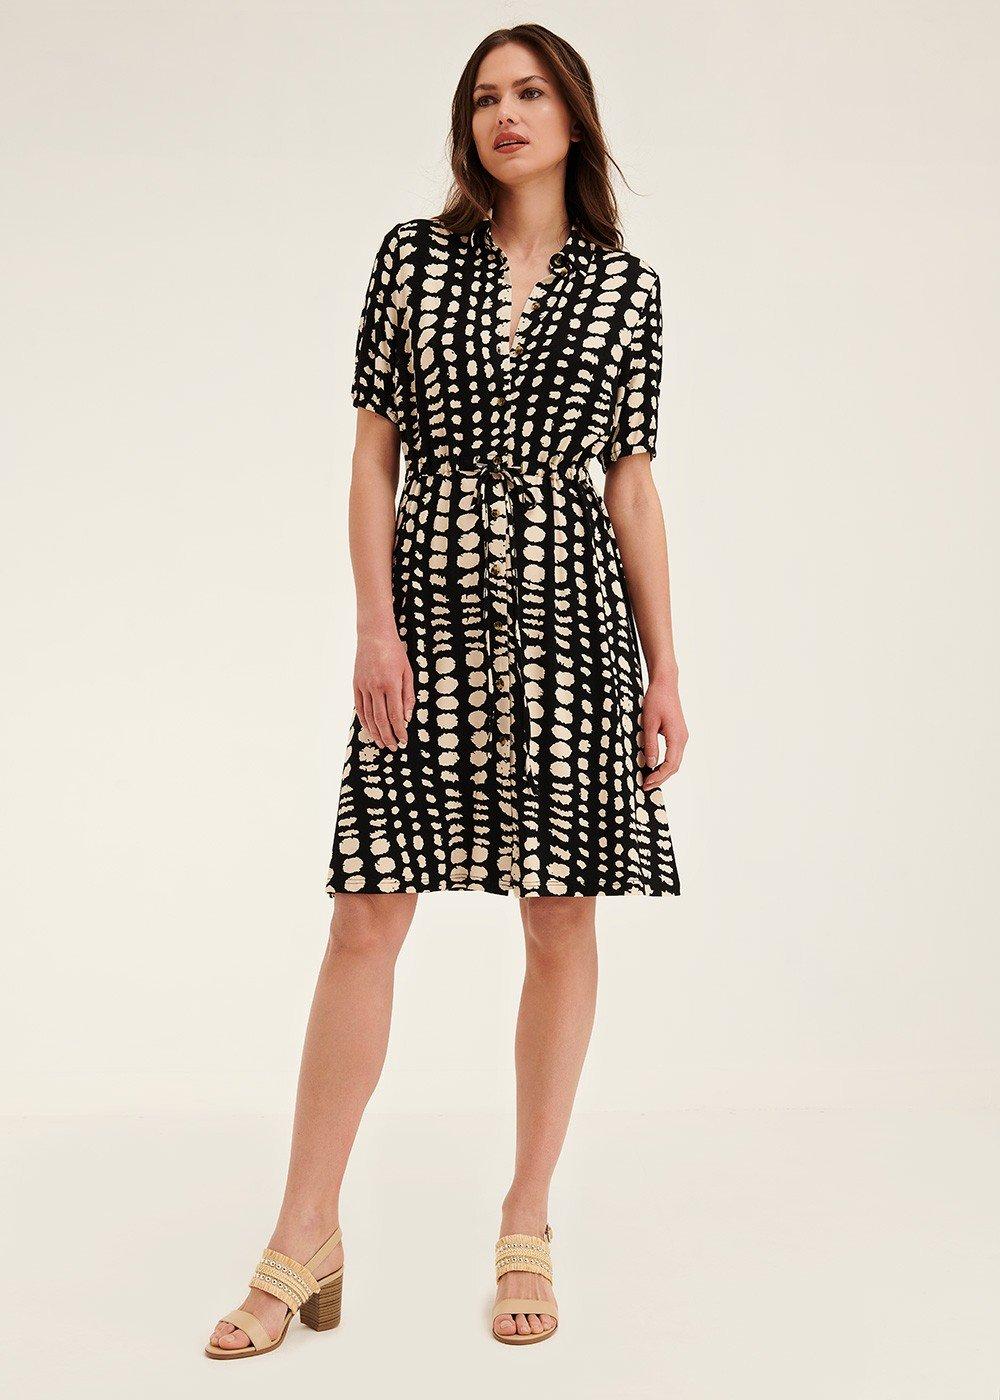 Arold dress with polka-dot pattern - Black / Latte Fantasia - Woman